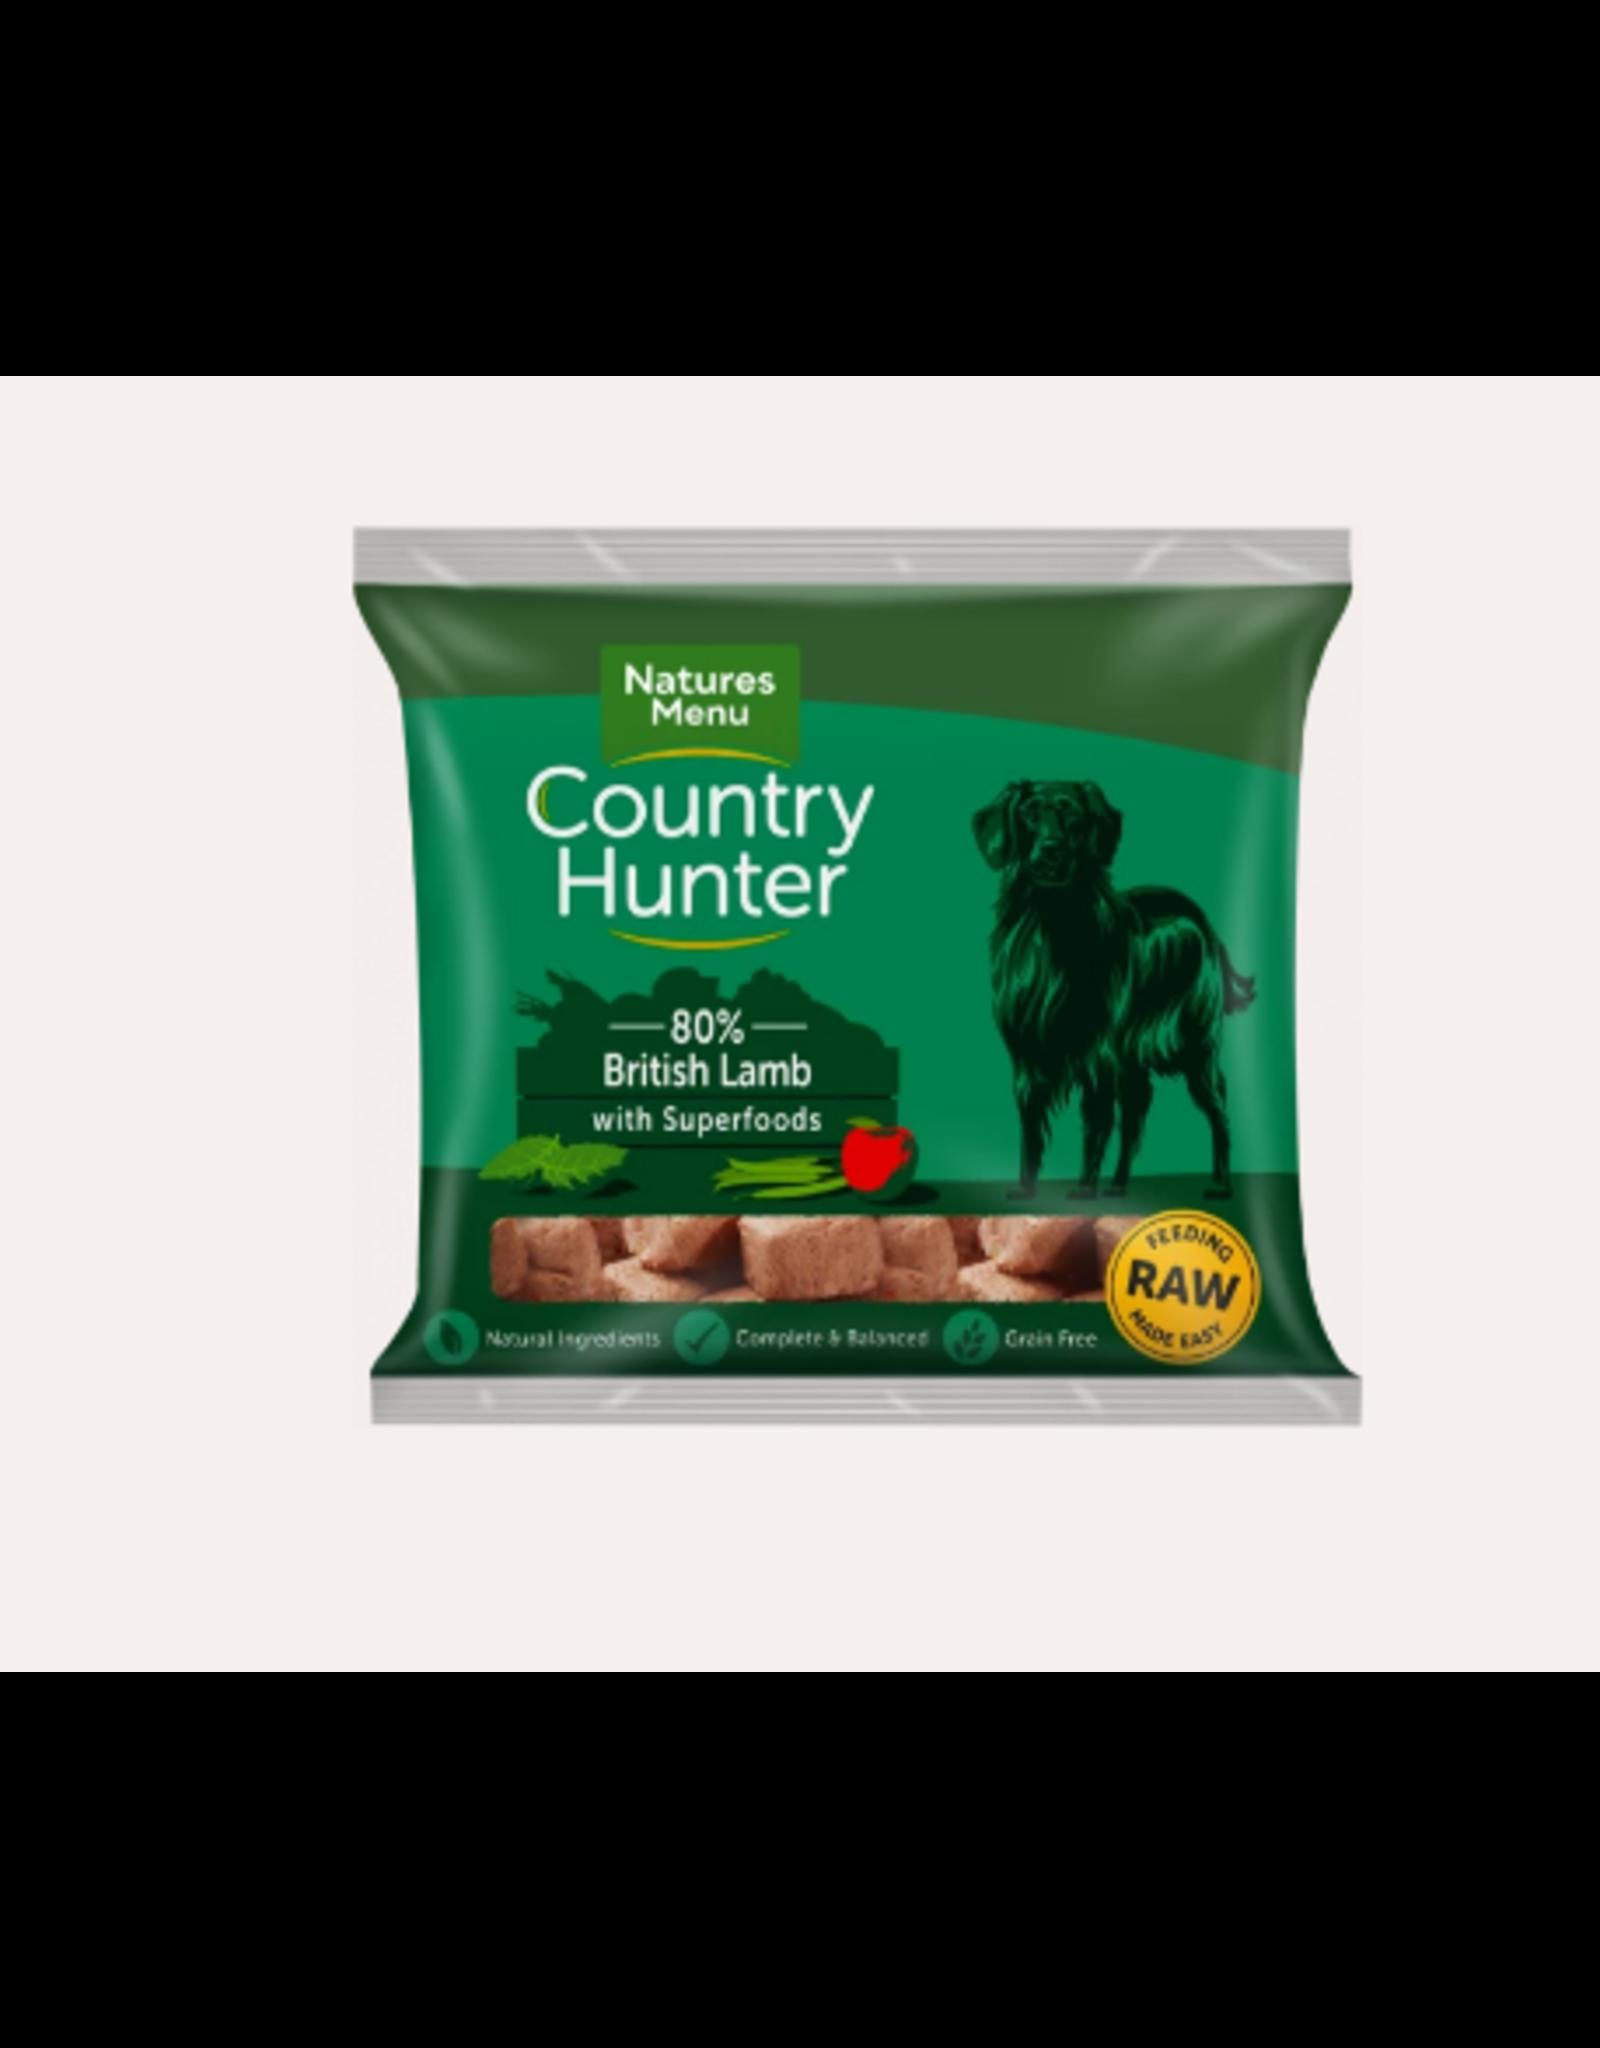 Natures Menu Country Hunter Nuggets British Lamb 1kg